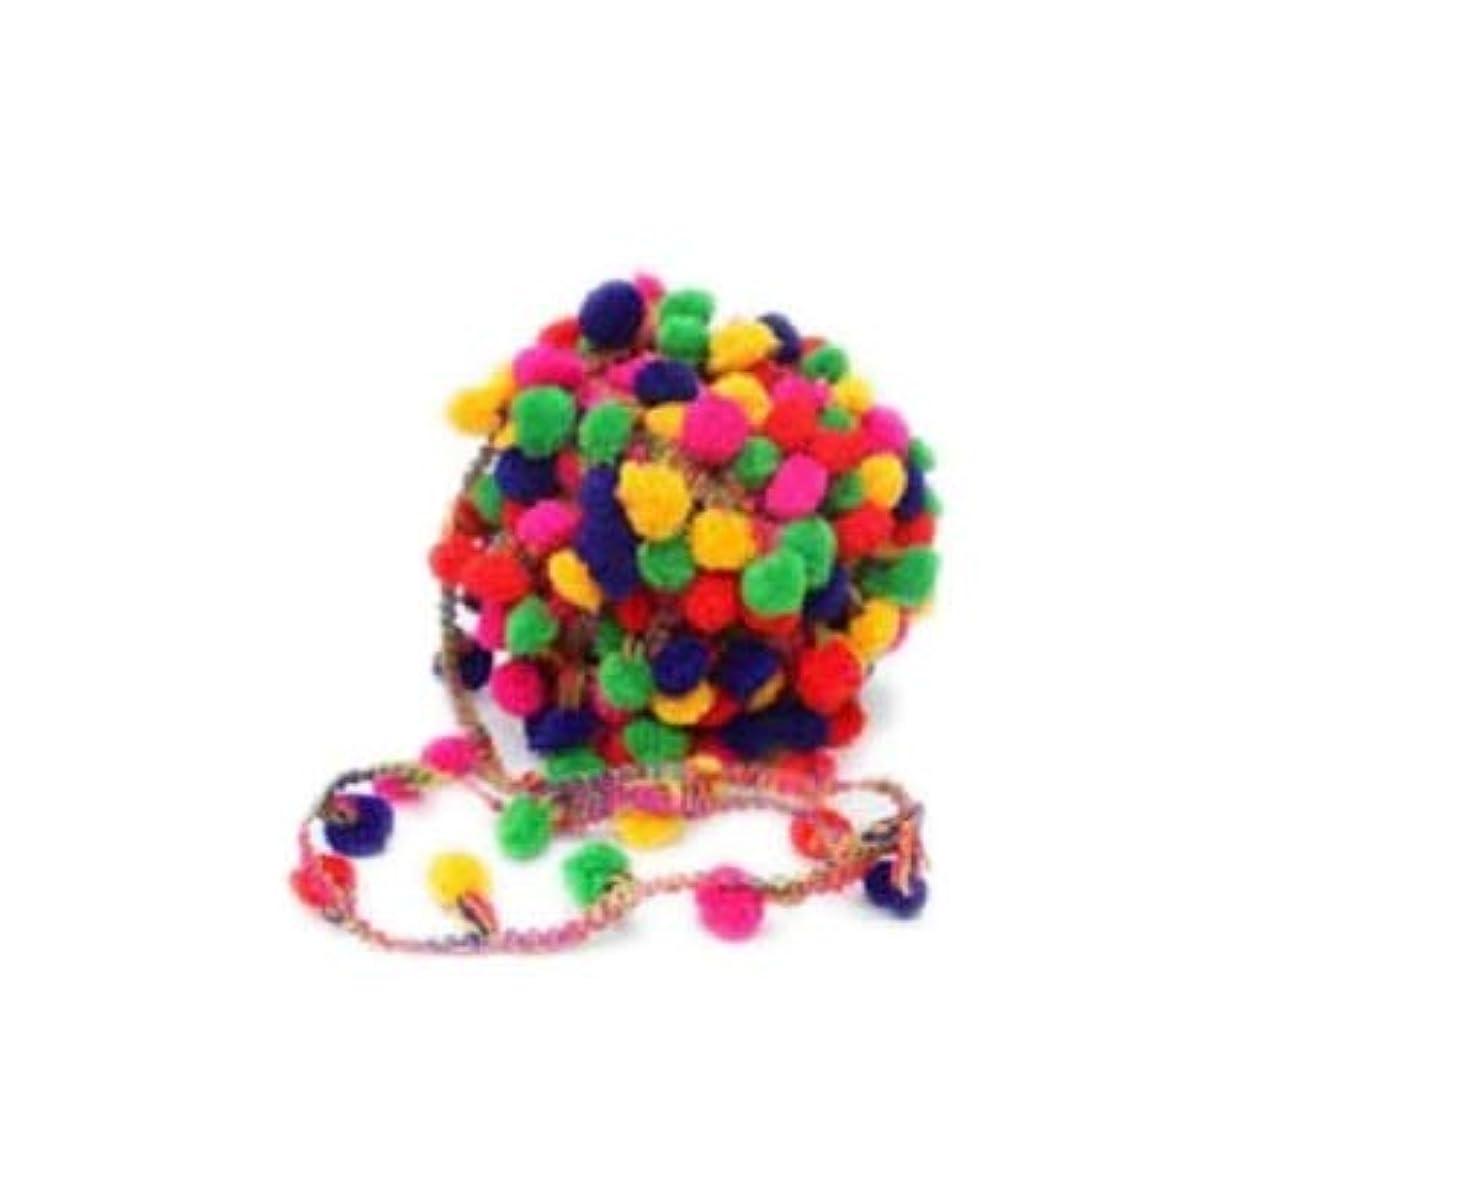 Indian Accent Multicoloured Pom pom Trim Lace Ribbon Dress Decor Fringe (27 yd)